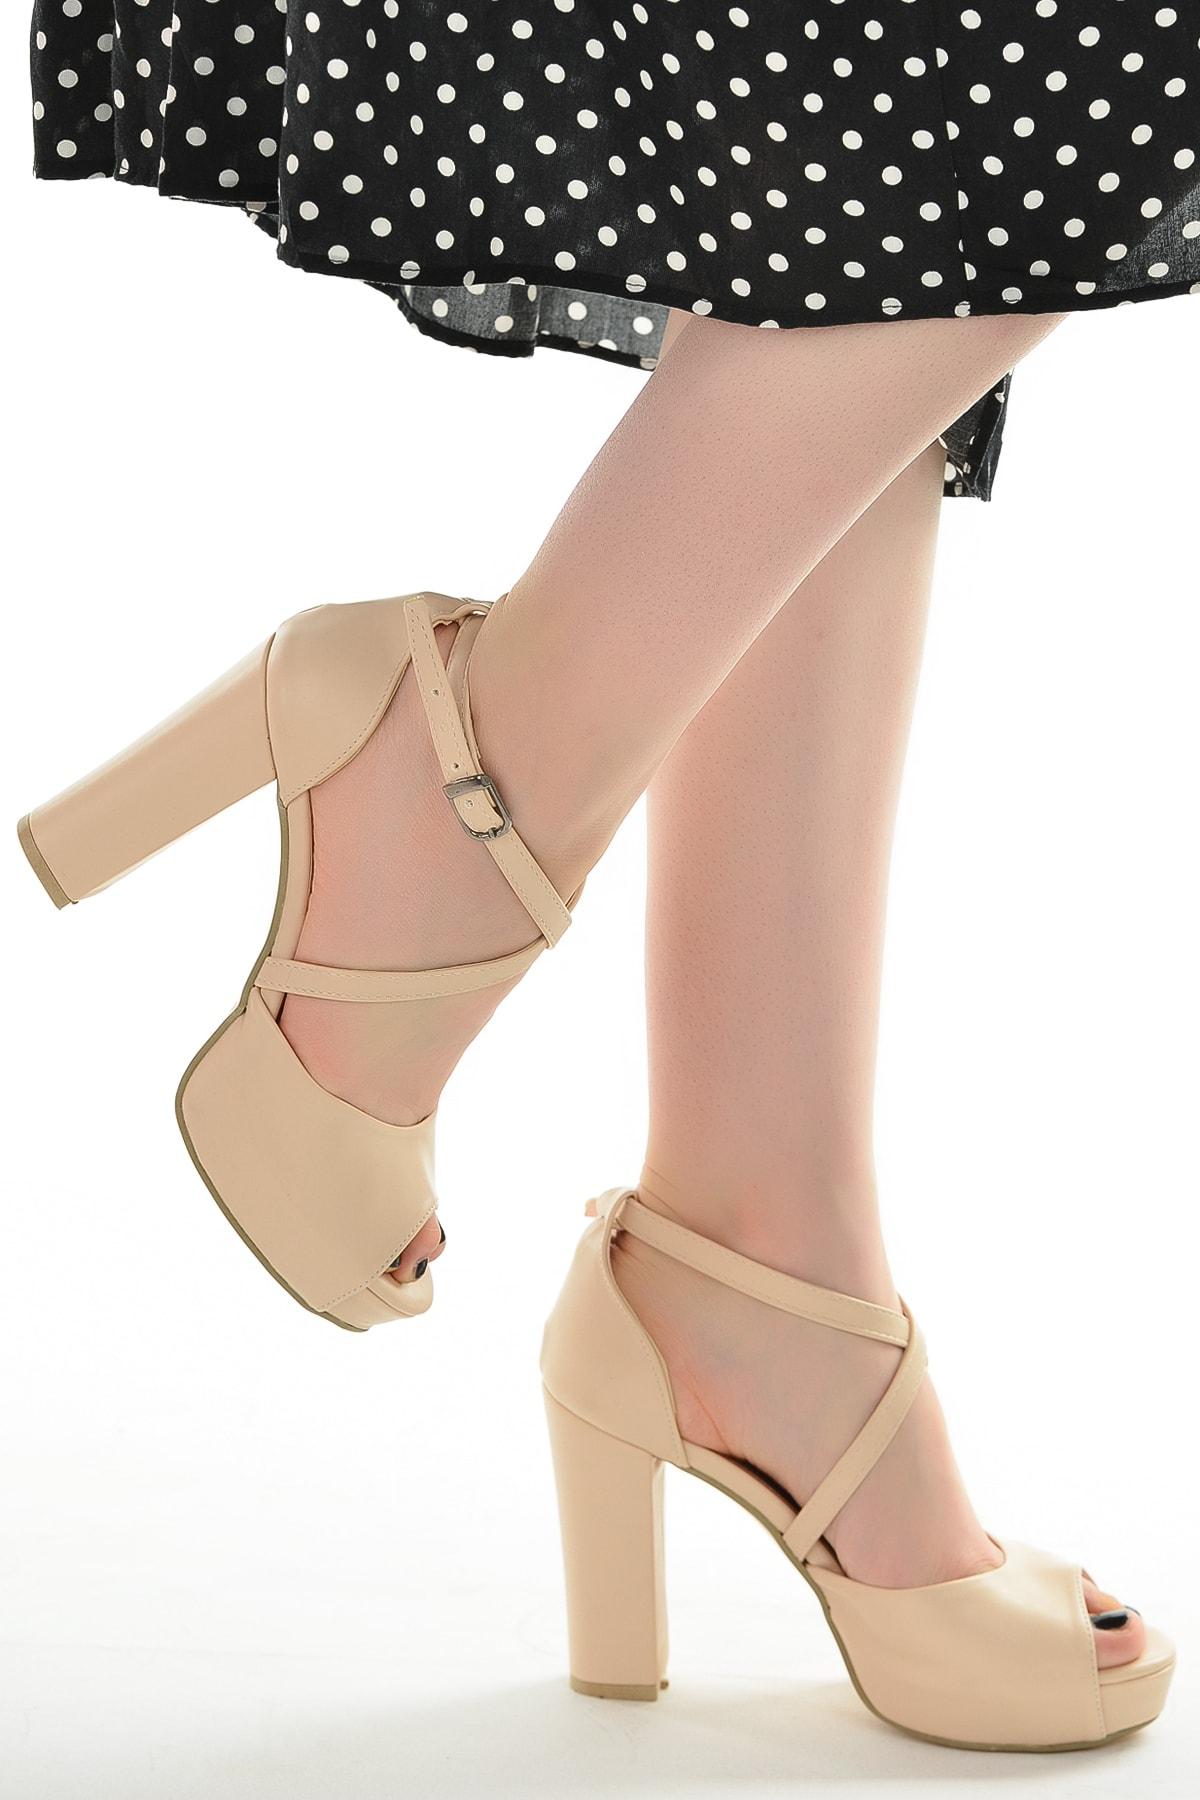 Ayakland Cilt Abiye 11 cm Platform Topuk Sandalet Ayakkabı 3210-2058 2